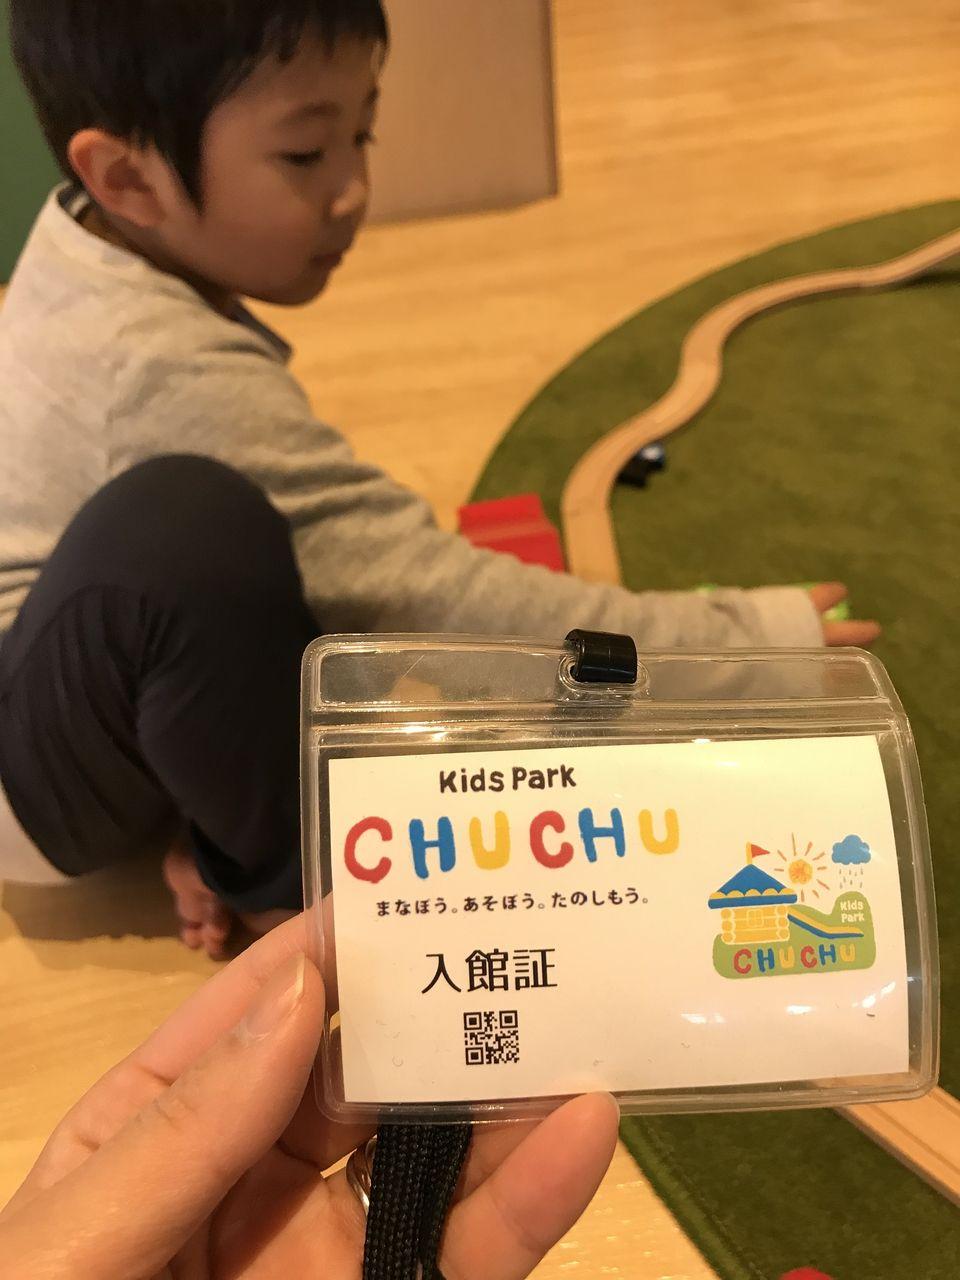 Kids Park CHUCHUの入館証の写真